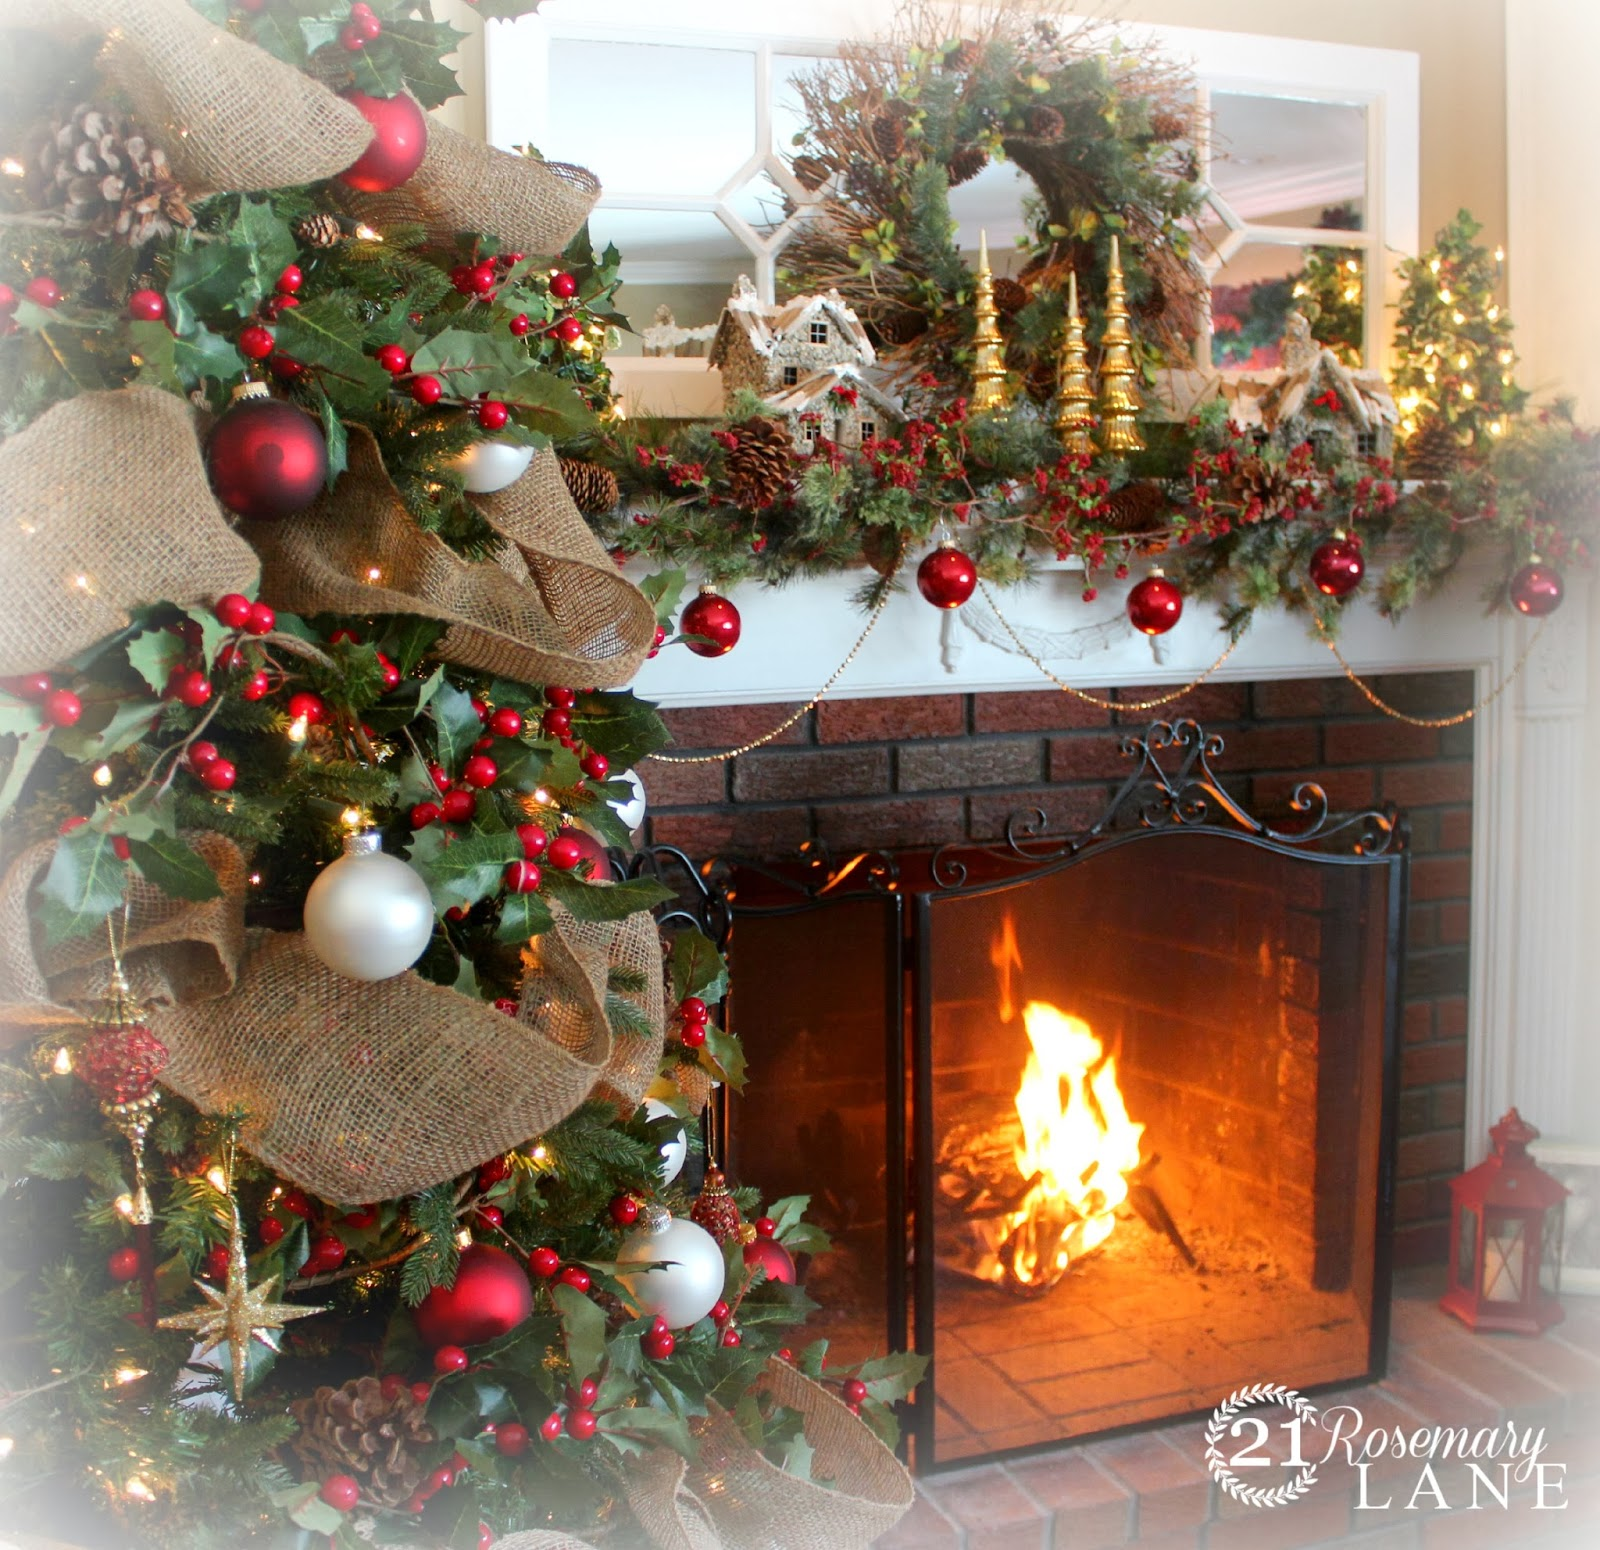 21 Rosemary Lane: 2013 Christmas Mantel